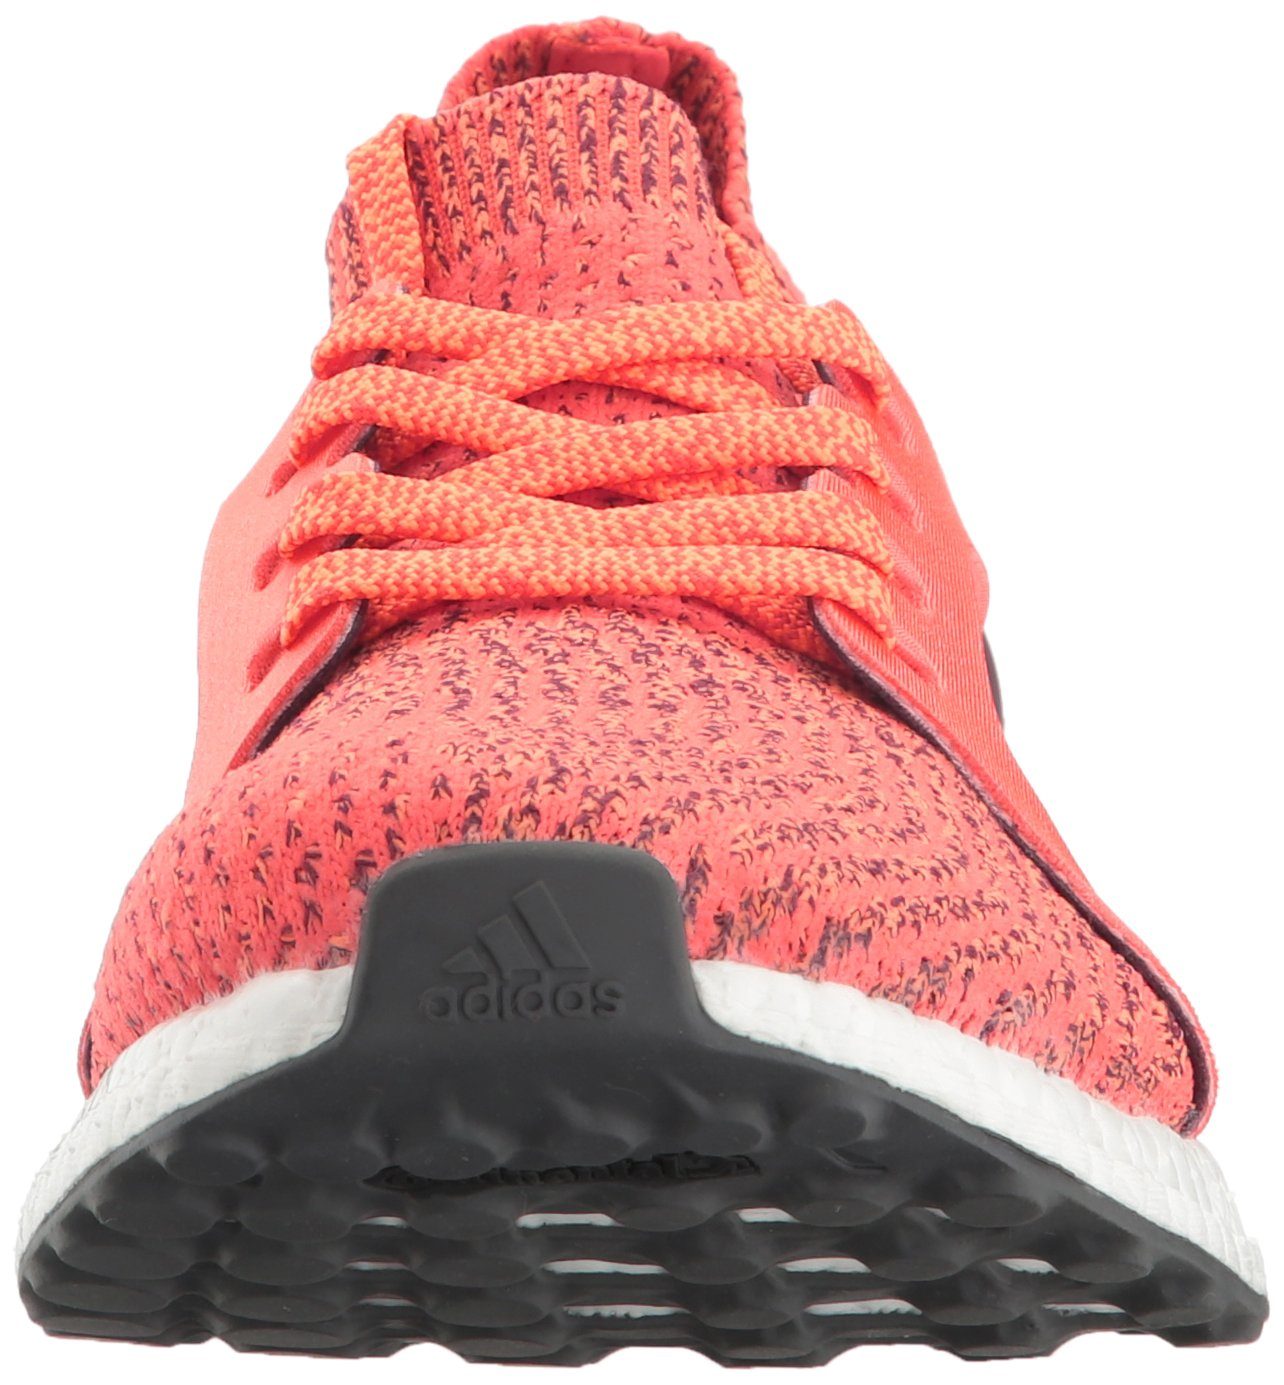 adidas// Performance Women s Ultraboost X Ultraboost// Lätt Coral Glow/ Light 05de45c - hotlink.pw